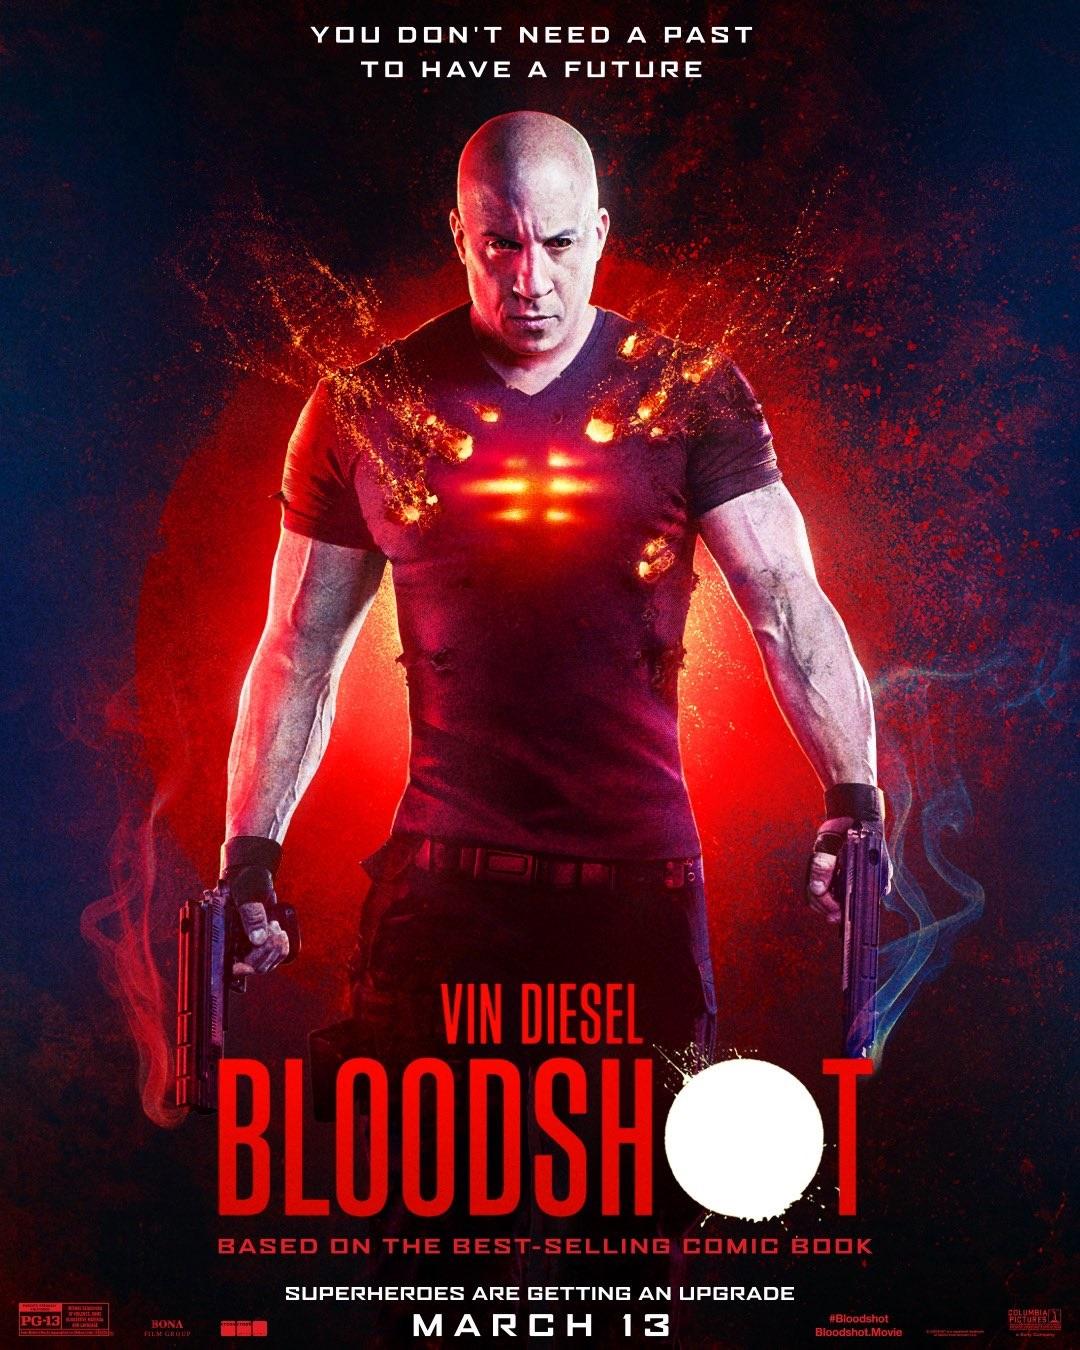 Vin Diesel Bloodshot Film Logo by Rian Hughes